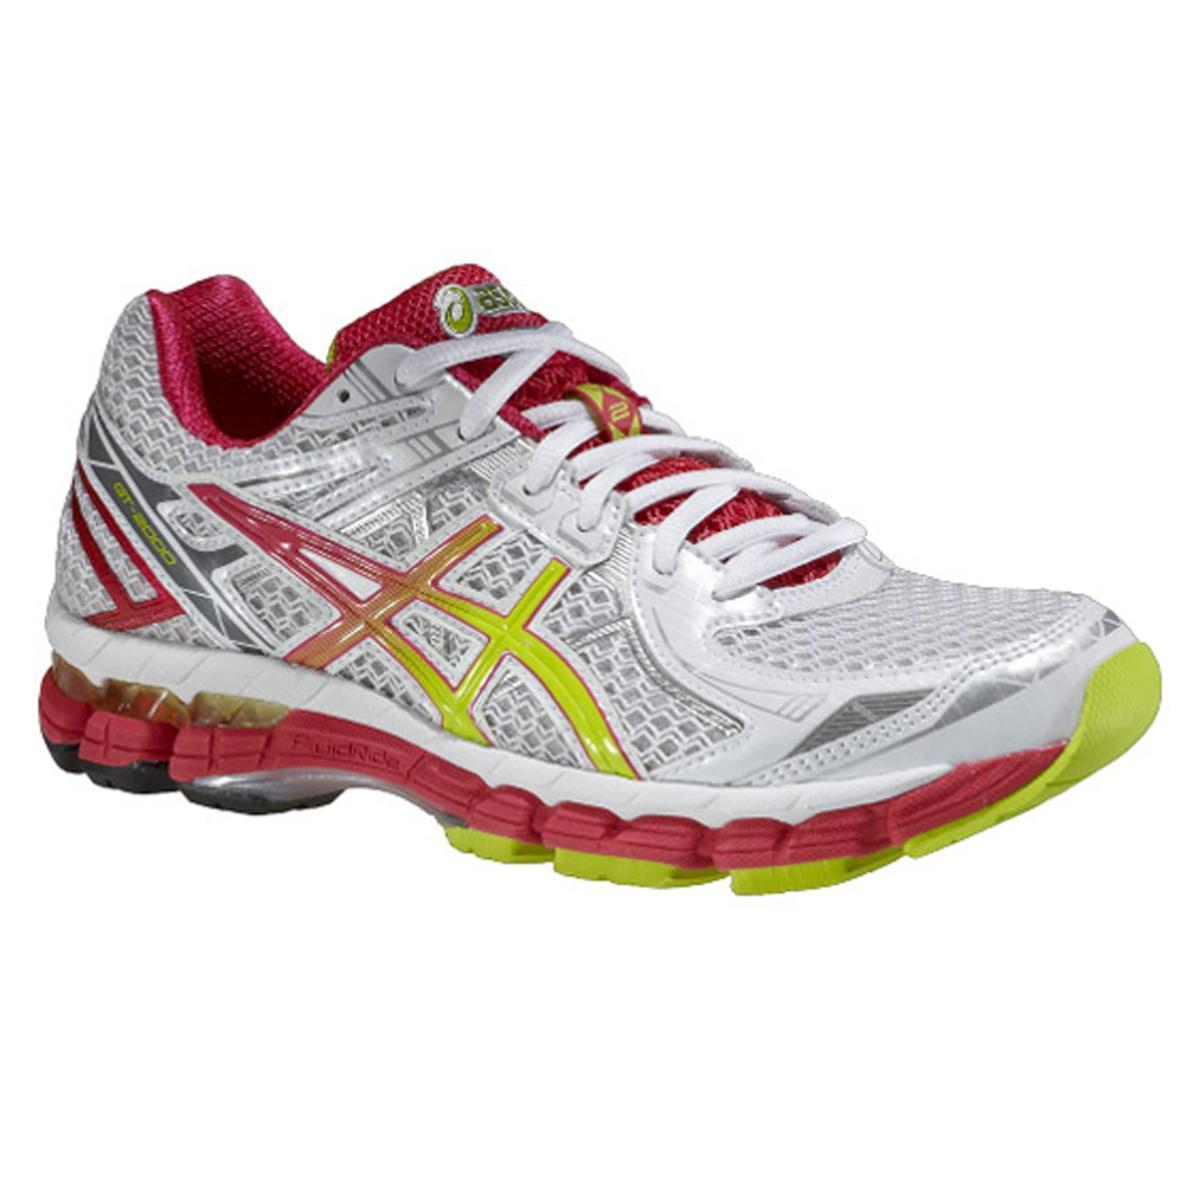 Asics Womens GT-2000 2 Running Shoes - White/Lime